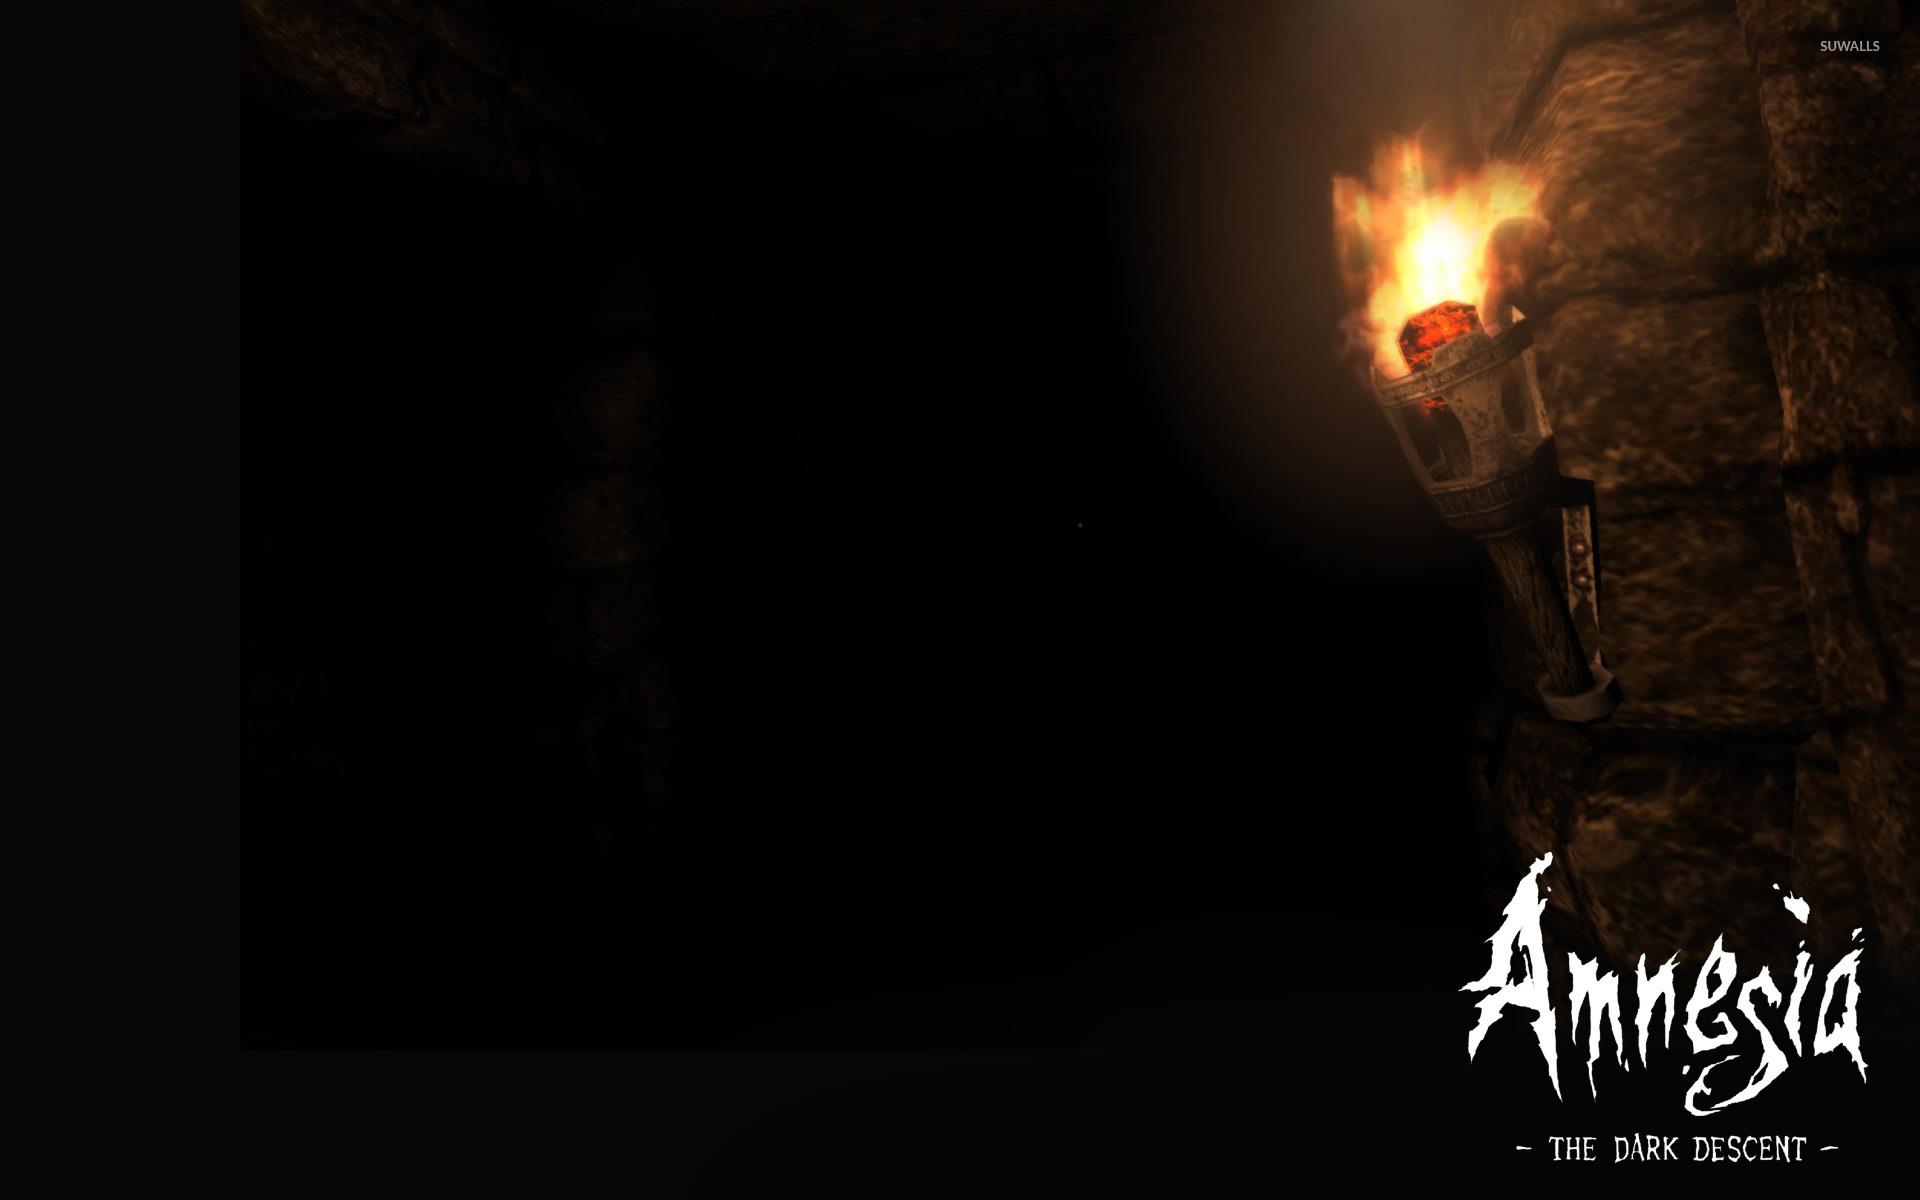 Amnesia The Dark Descent 5 Wallpaper Game Wallpapers 8926